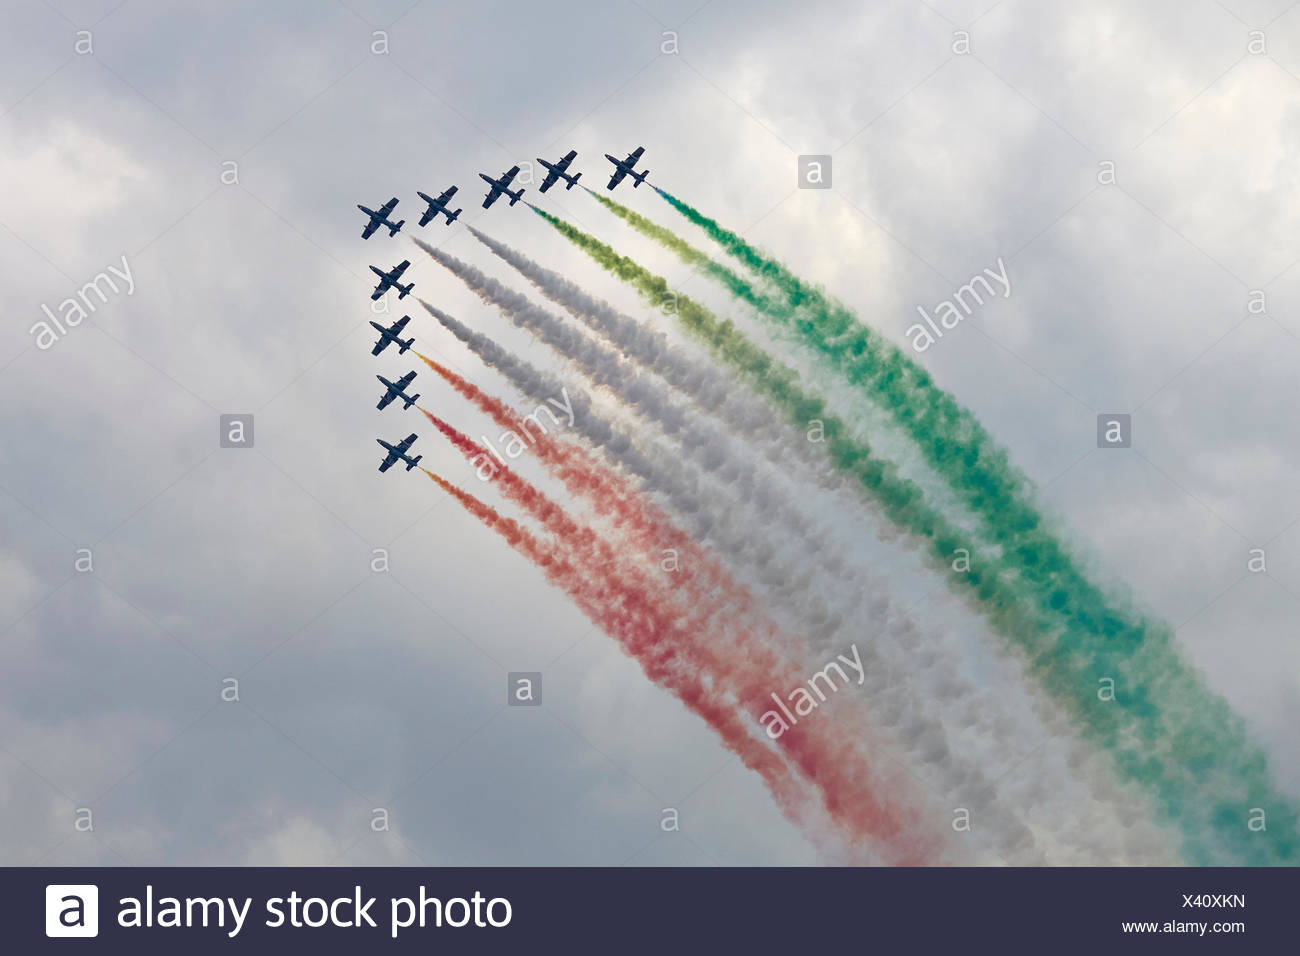 Frecce Tricolori, aerobatic demonstration team, airshow Airpower 2013, Zeltweg, Styria, Austria Stock Photo